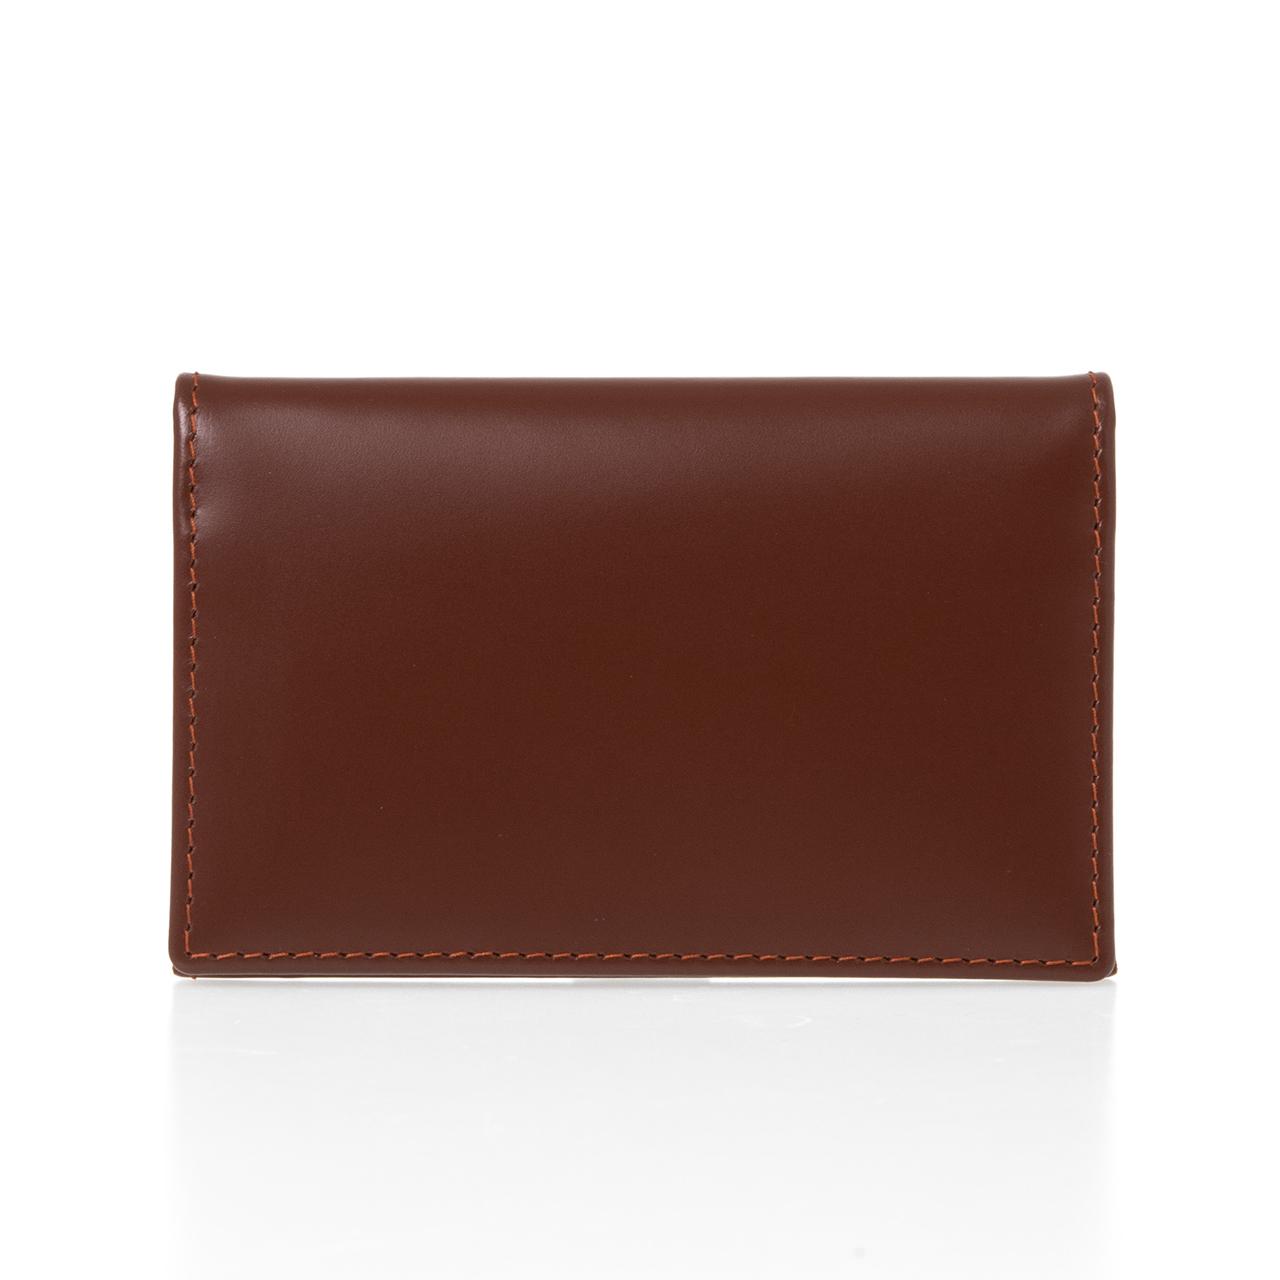 Ettinger Men Card Case Havana Brown Brei Dollar Leather Visiting Bh143jr Bridle Hide Collection